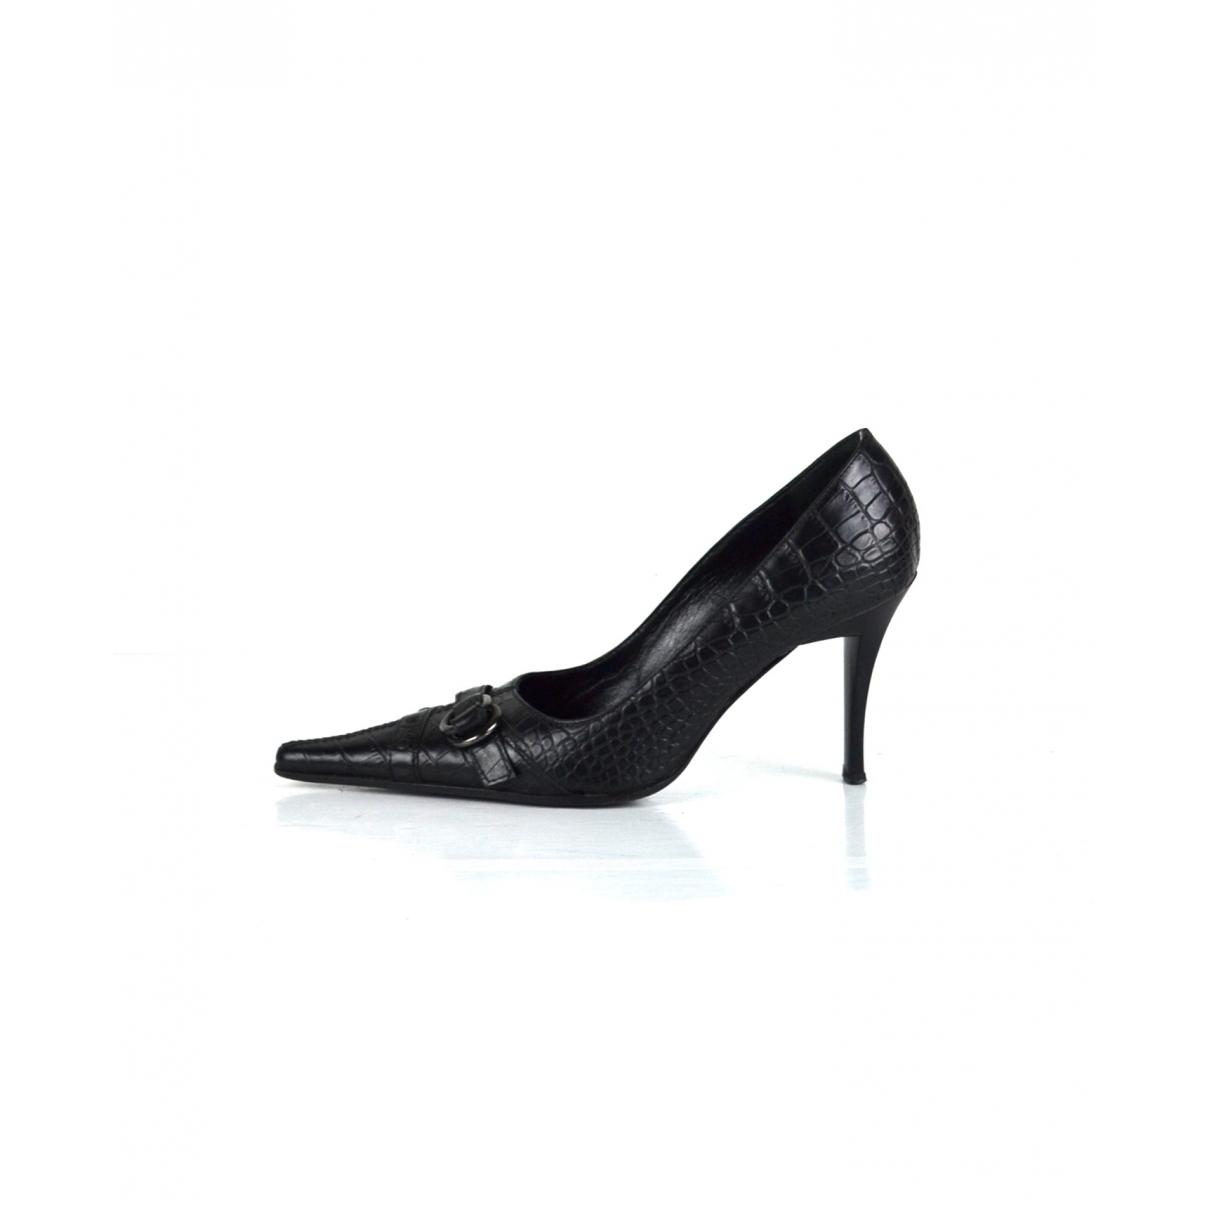 Cerruti \N Black Leather Heels for Women 39 EU